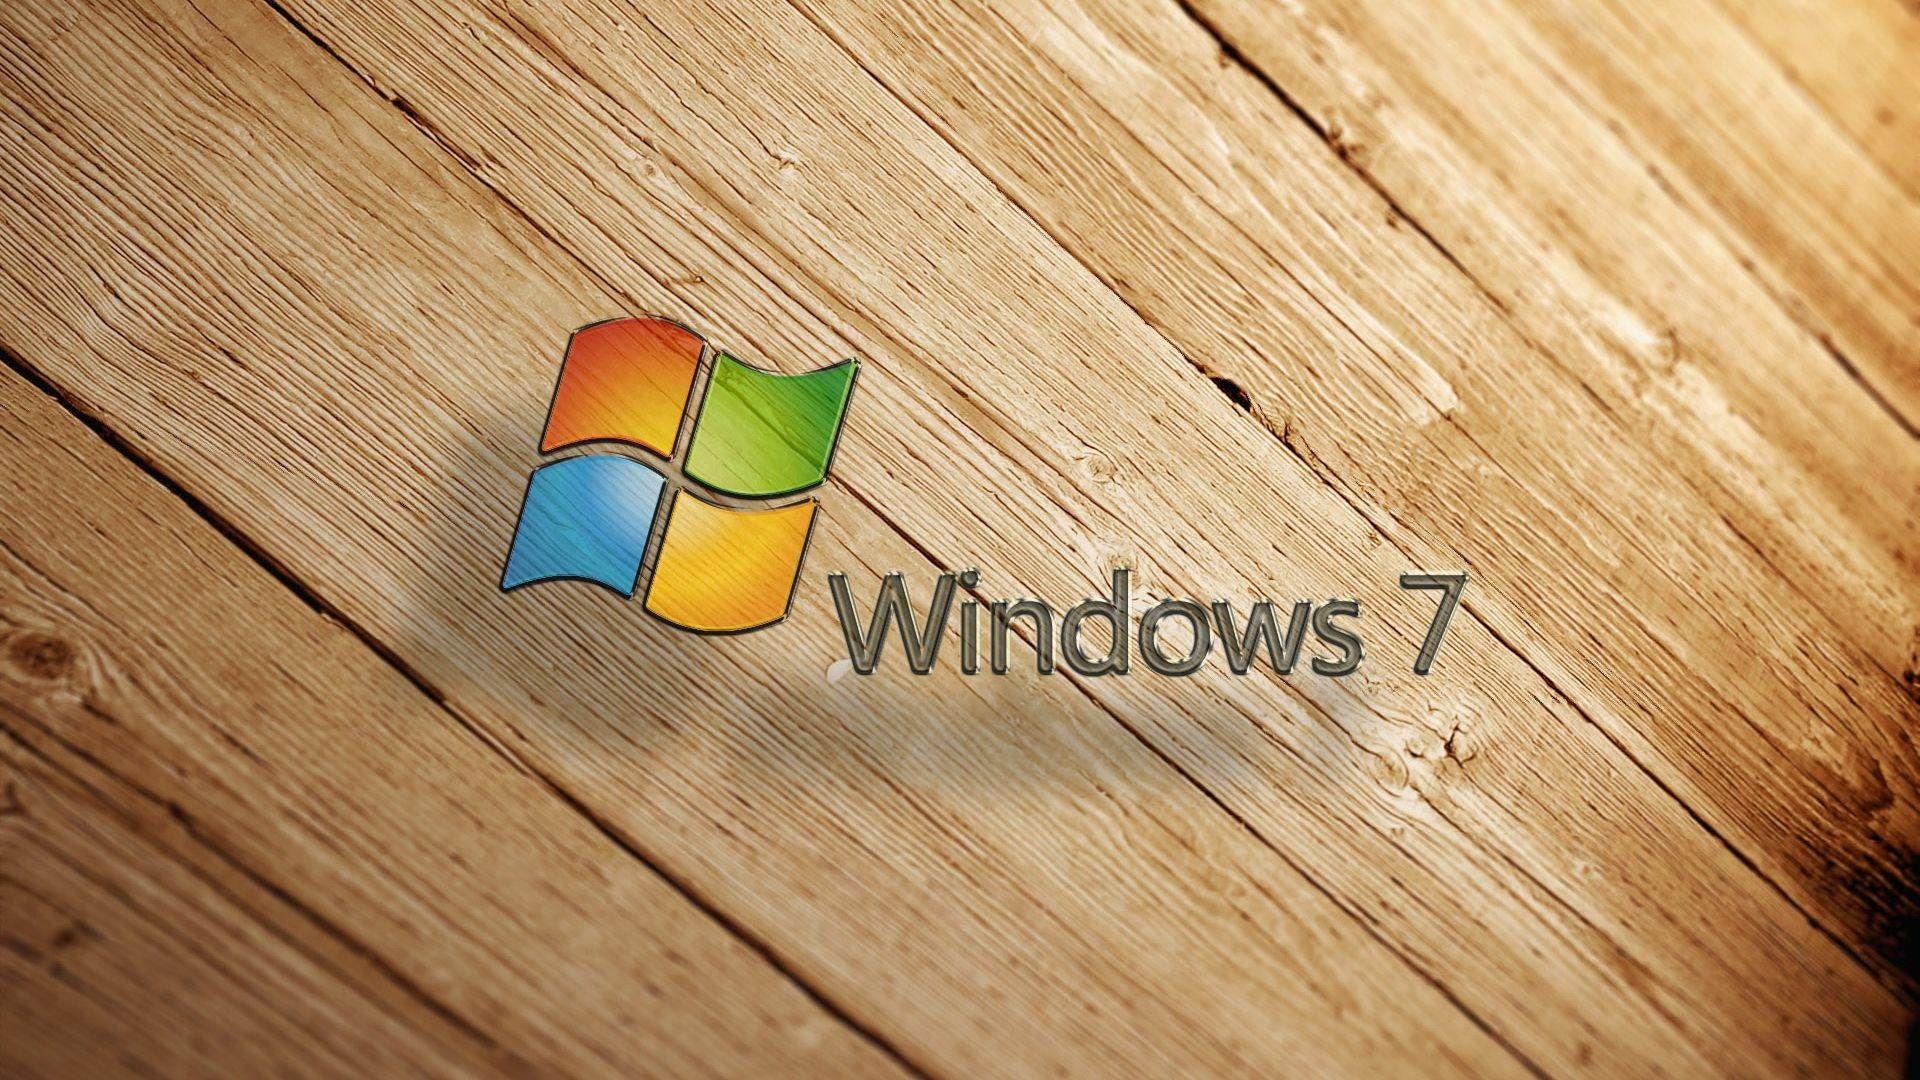 A Little Bit Of Personality U Engineering Windows 1920x1080 7 Default Wallpapers